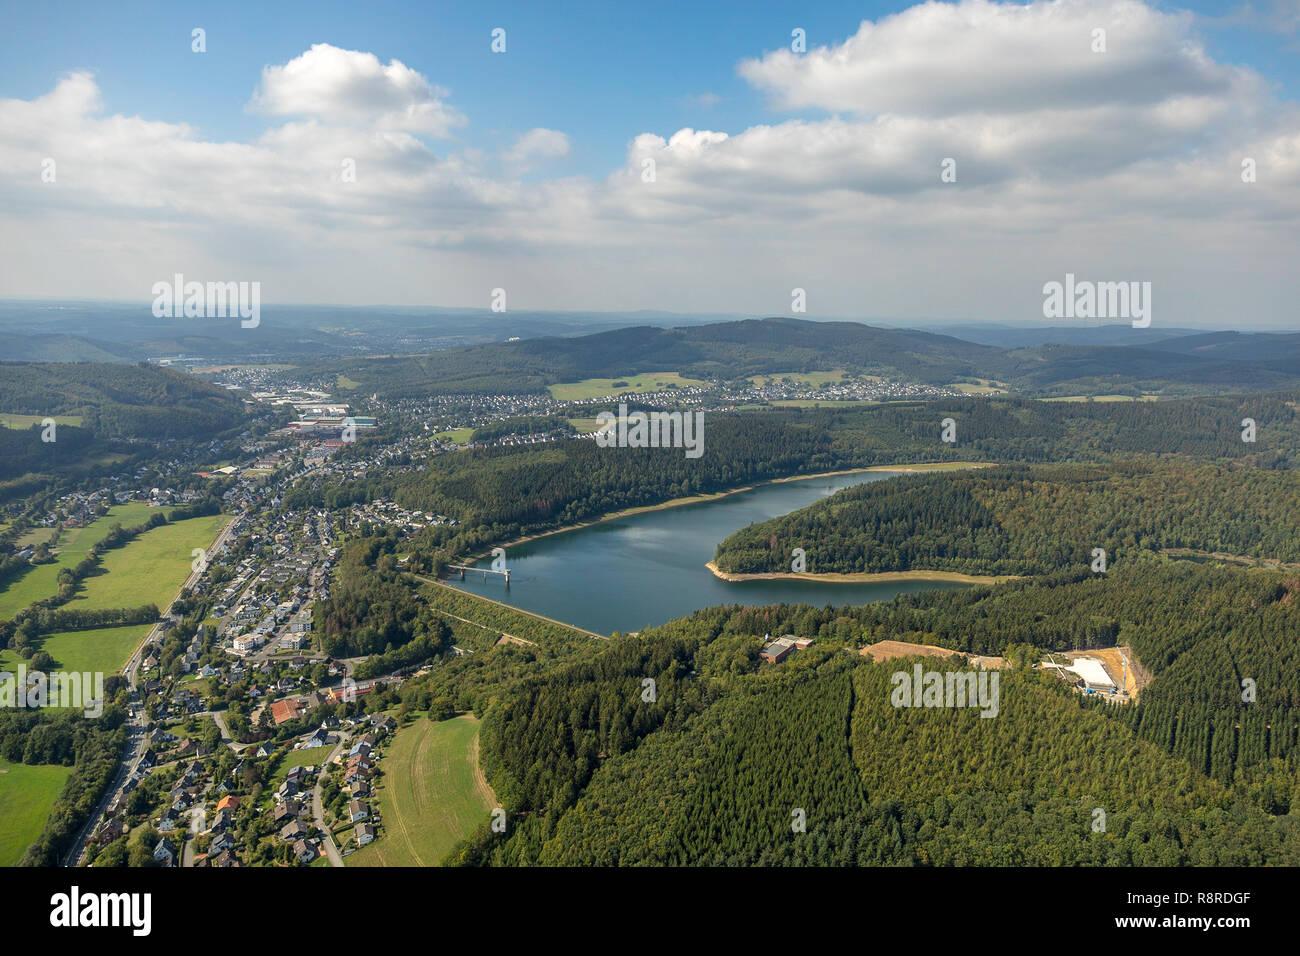 Aerial view, Breitenbach dam, dam, reservoir, clouds